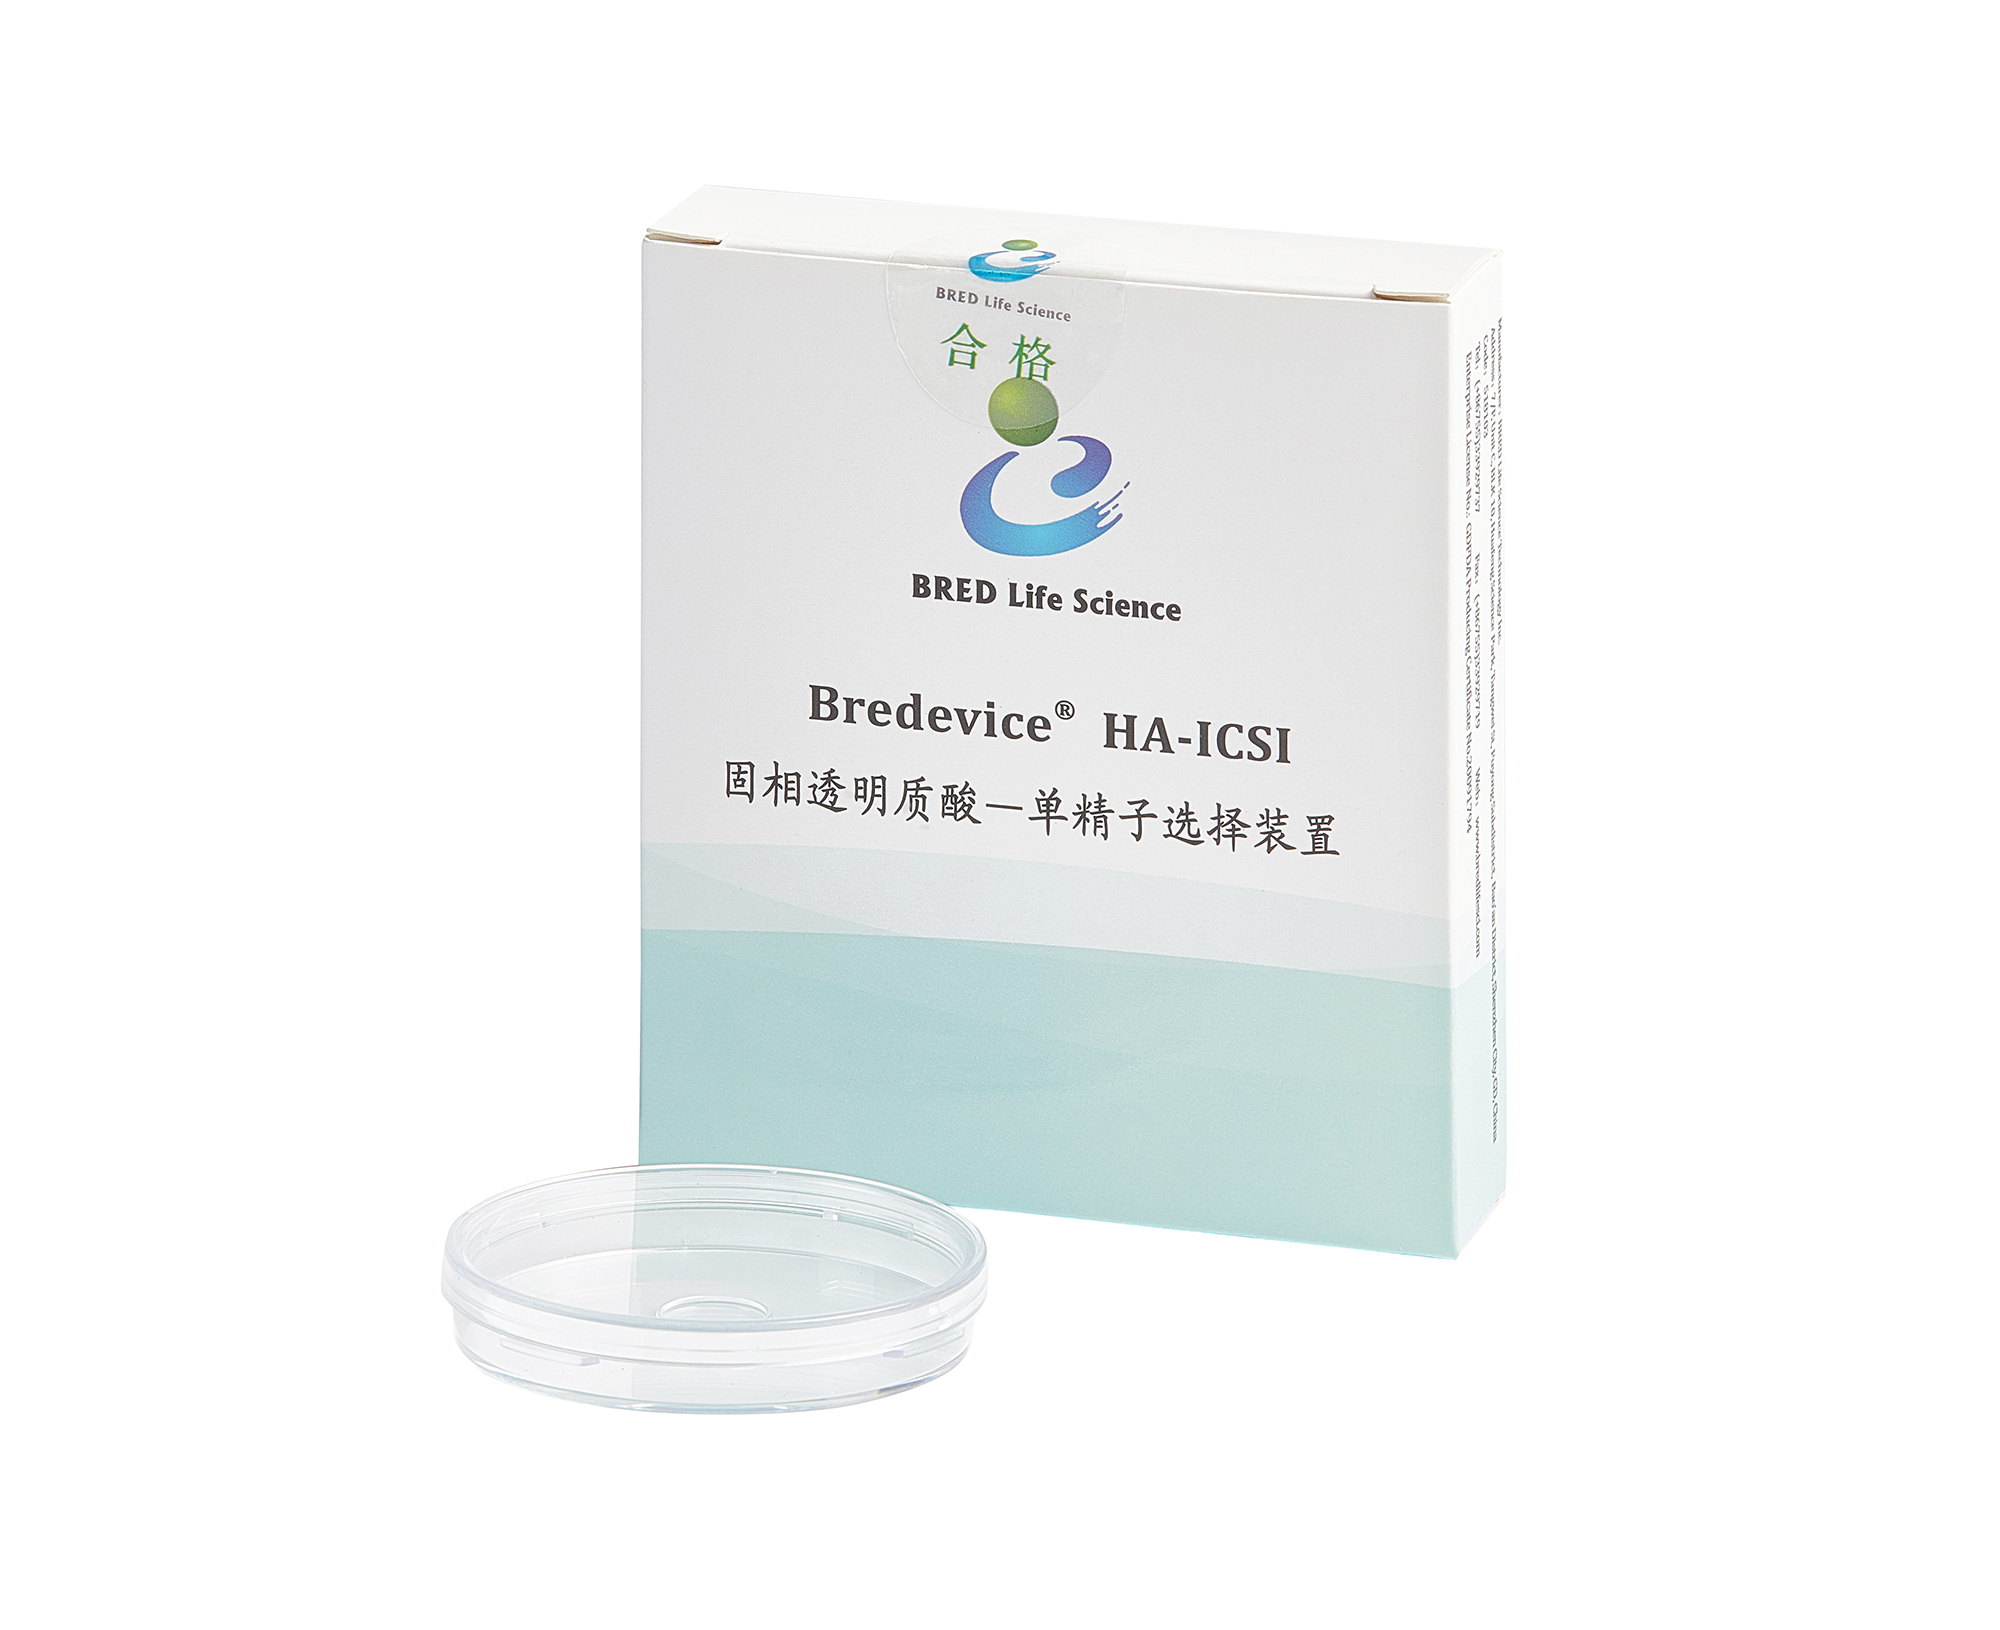 HA-ICSI 固相透明质酸-单精子选择装置